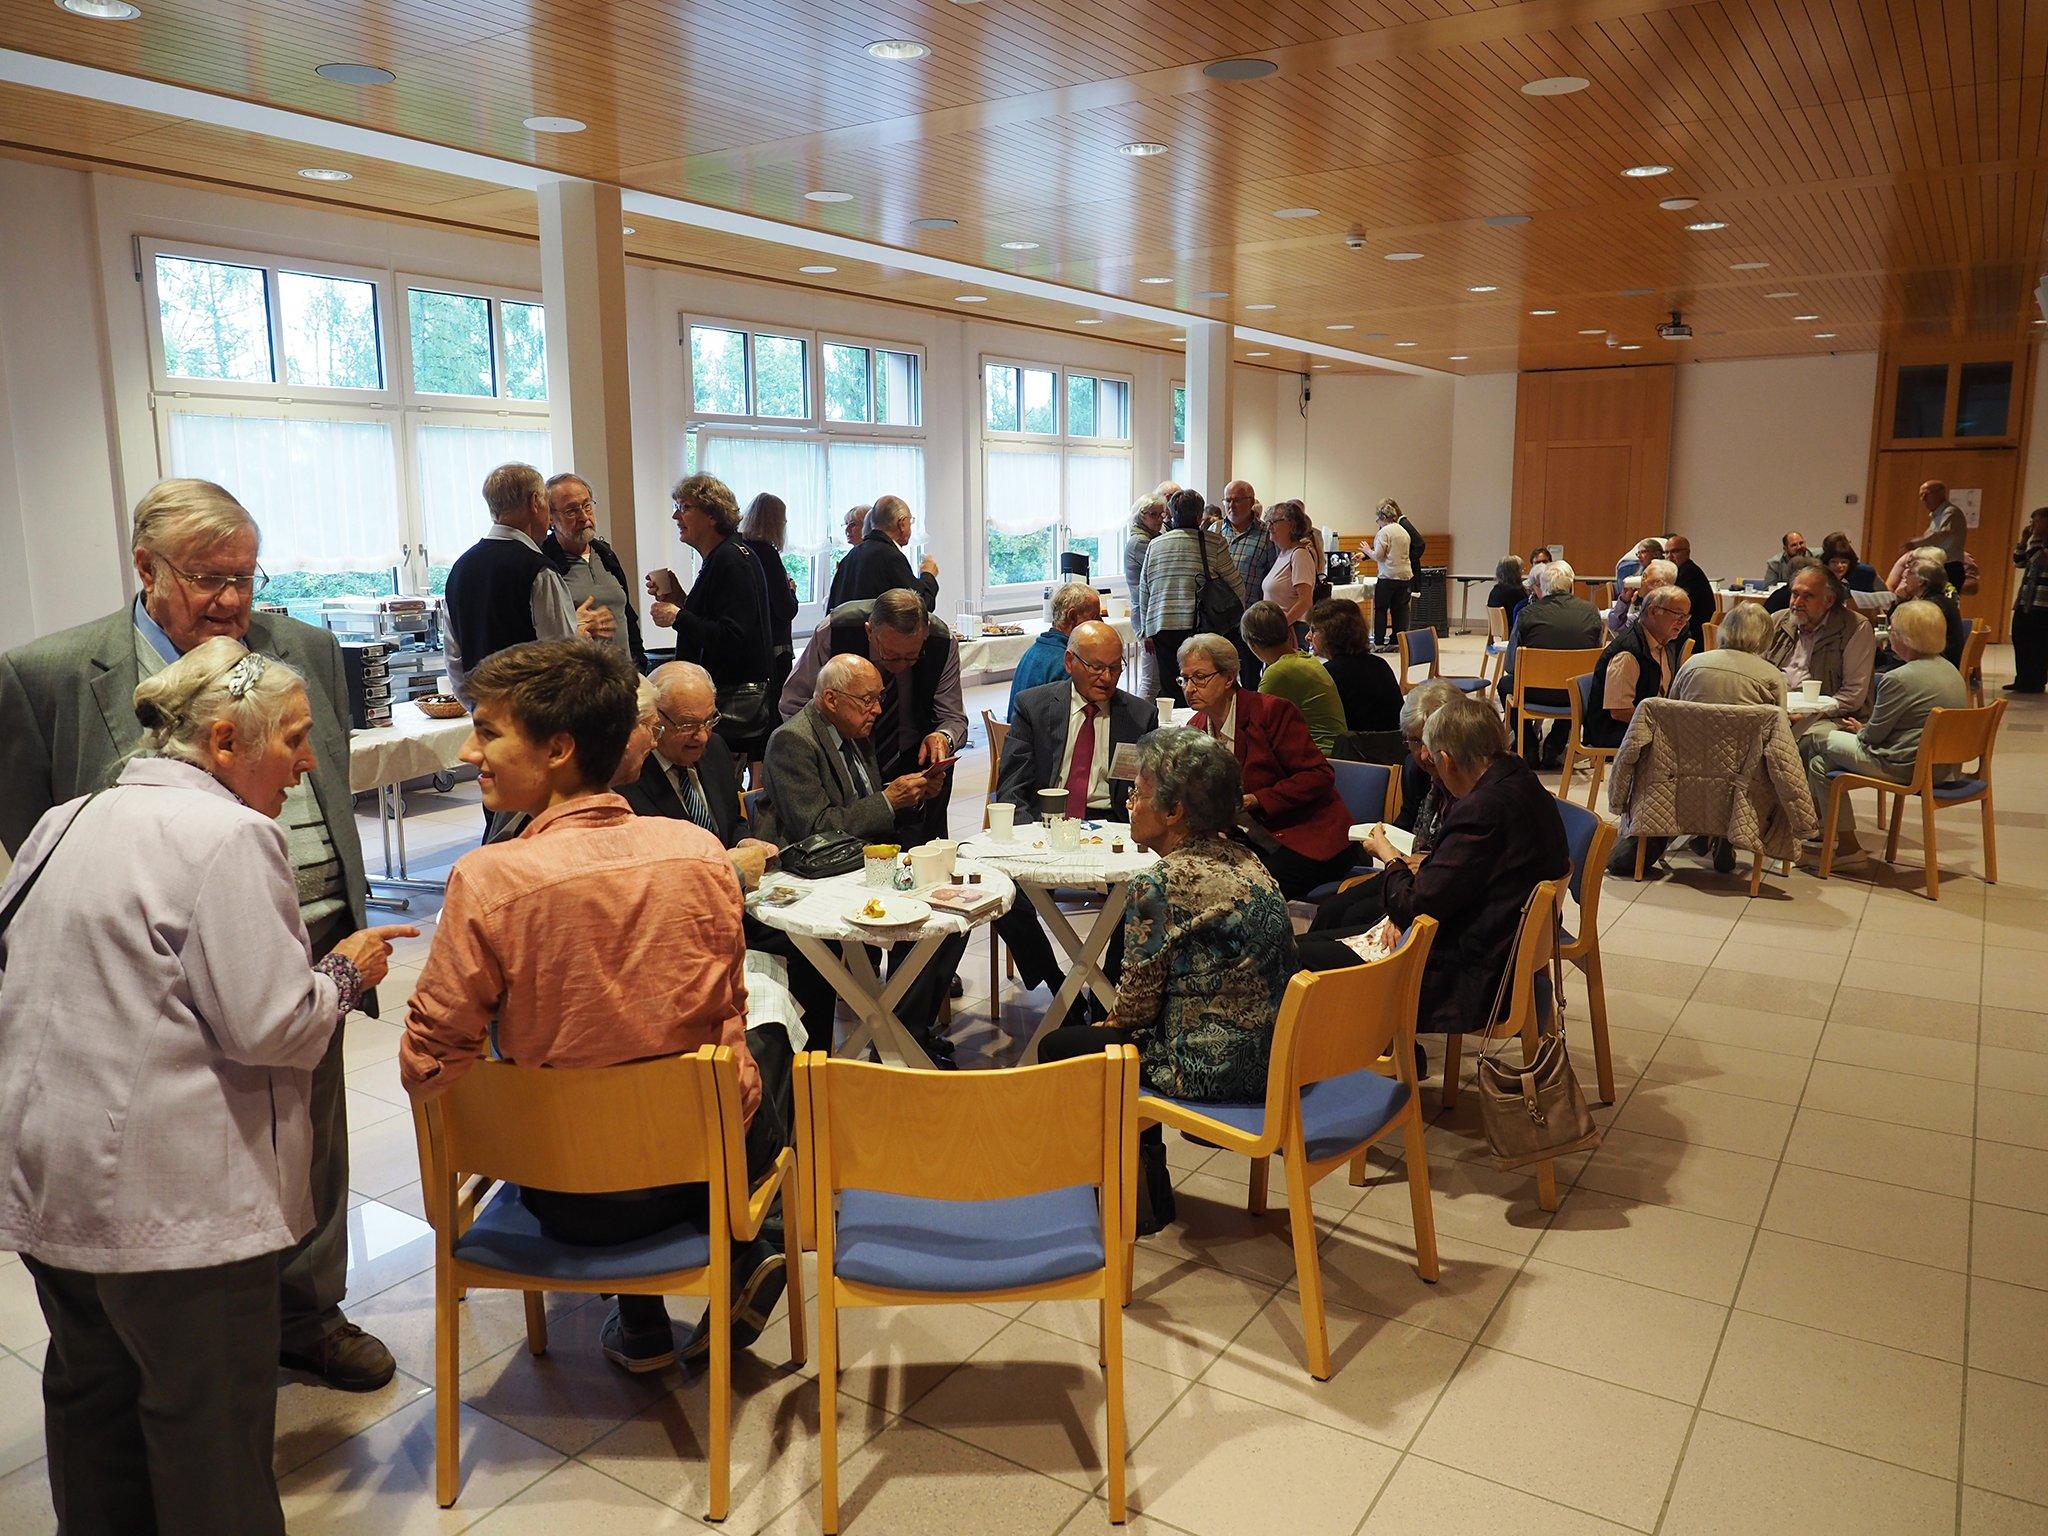 tsc-Jubiläumstreffen 2019: Kaffeetrinken mit ehemaligen Klassenkameraden